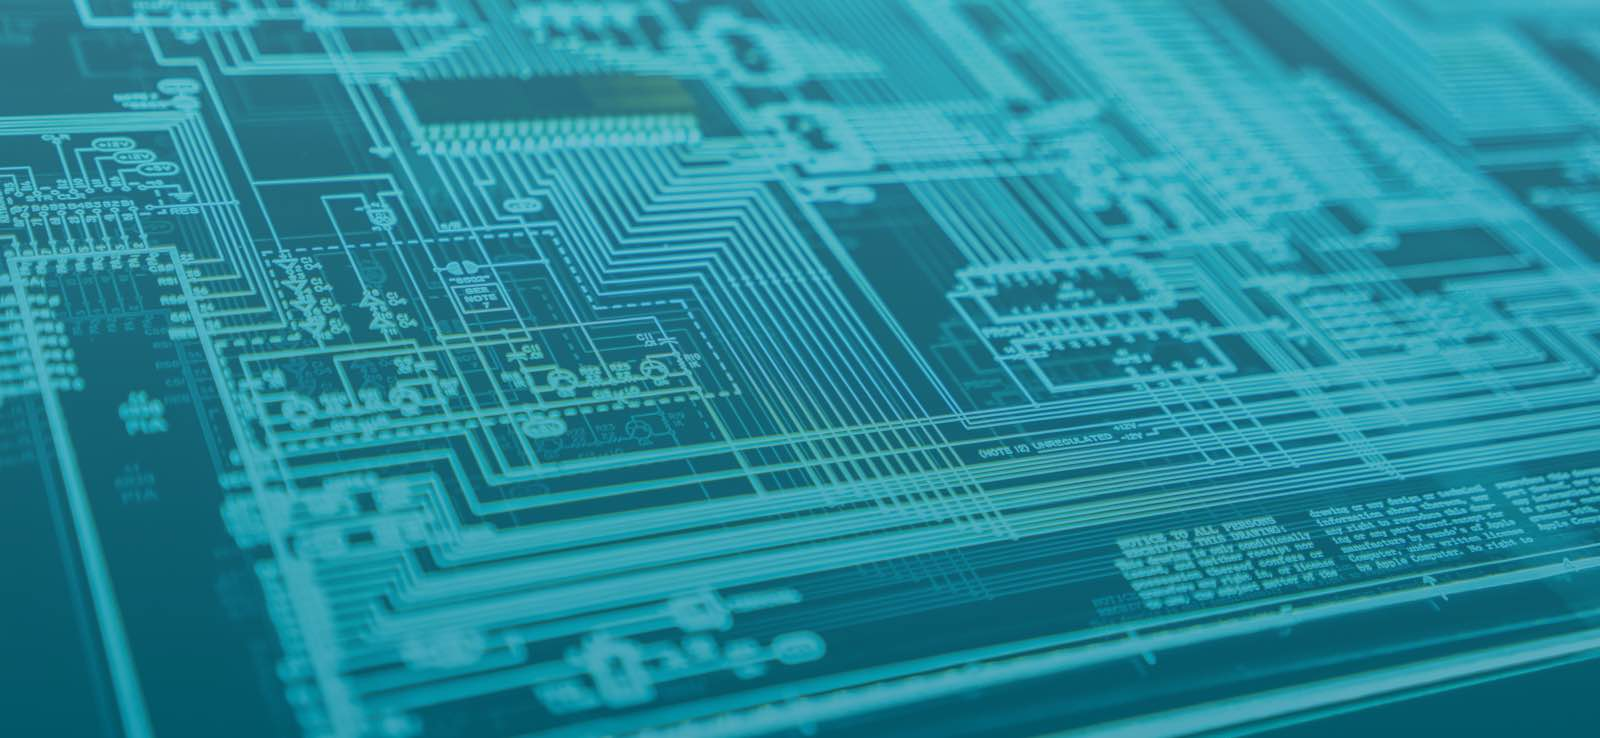 IT circuit board